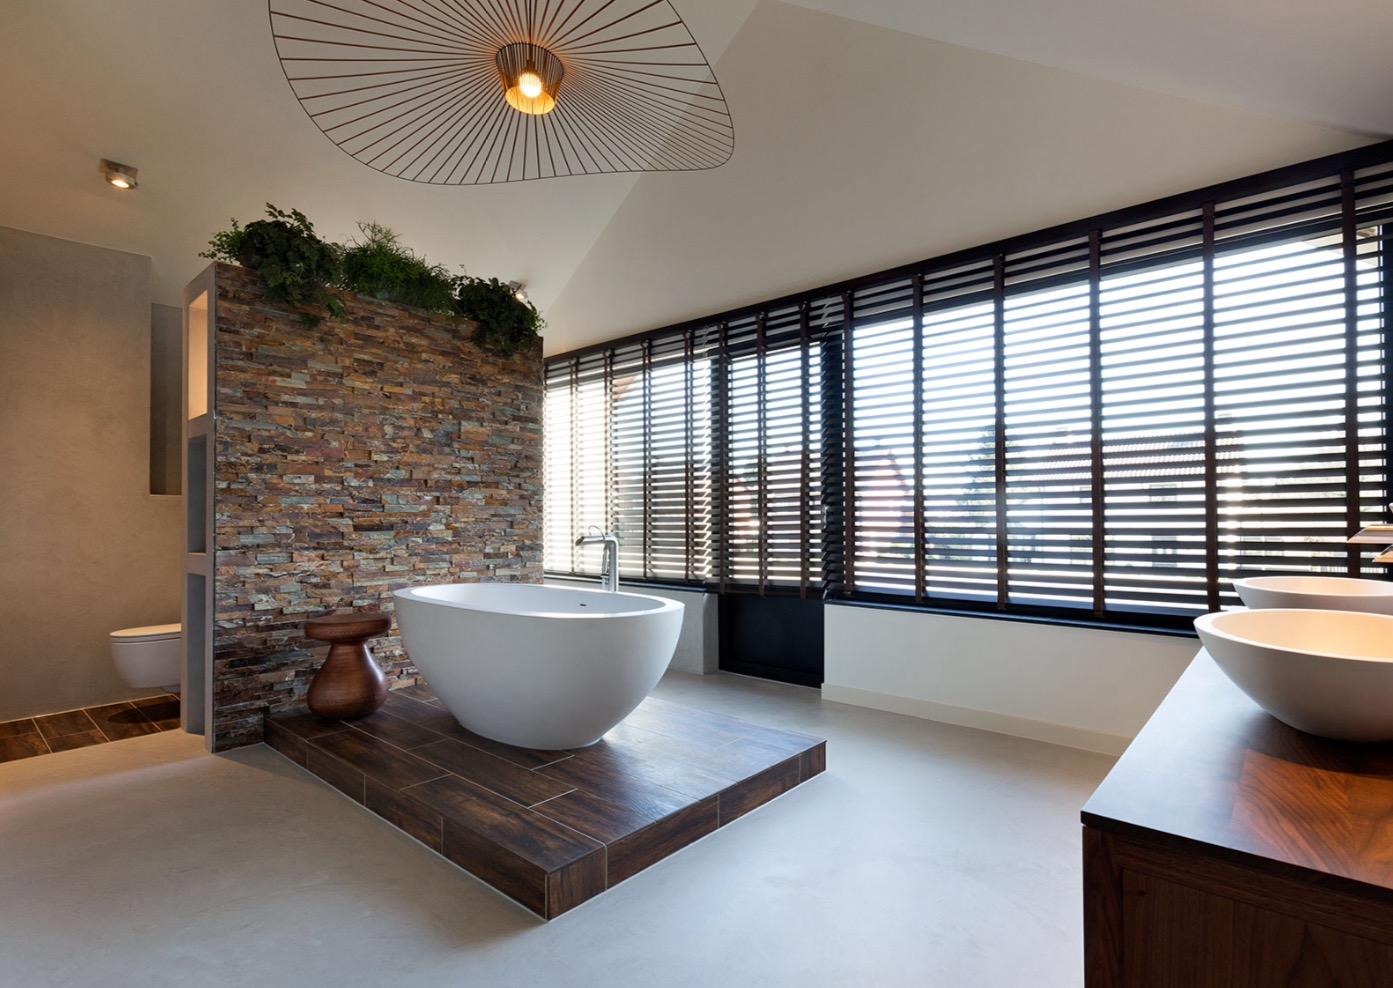 Badkamer Showroom Houten : Badkamer sanitair showroom in sittard badstudio elly houben